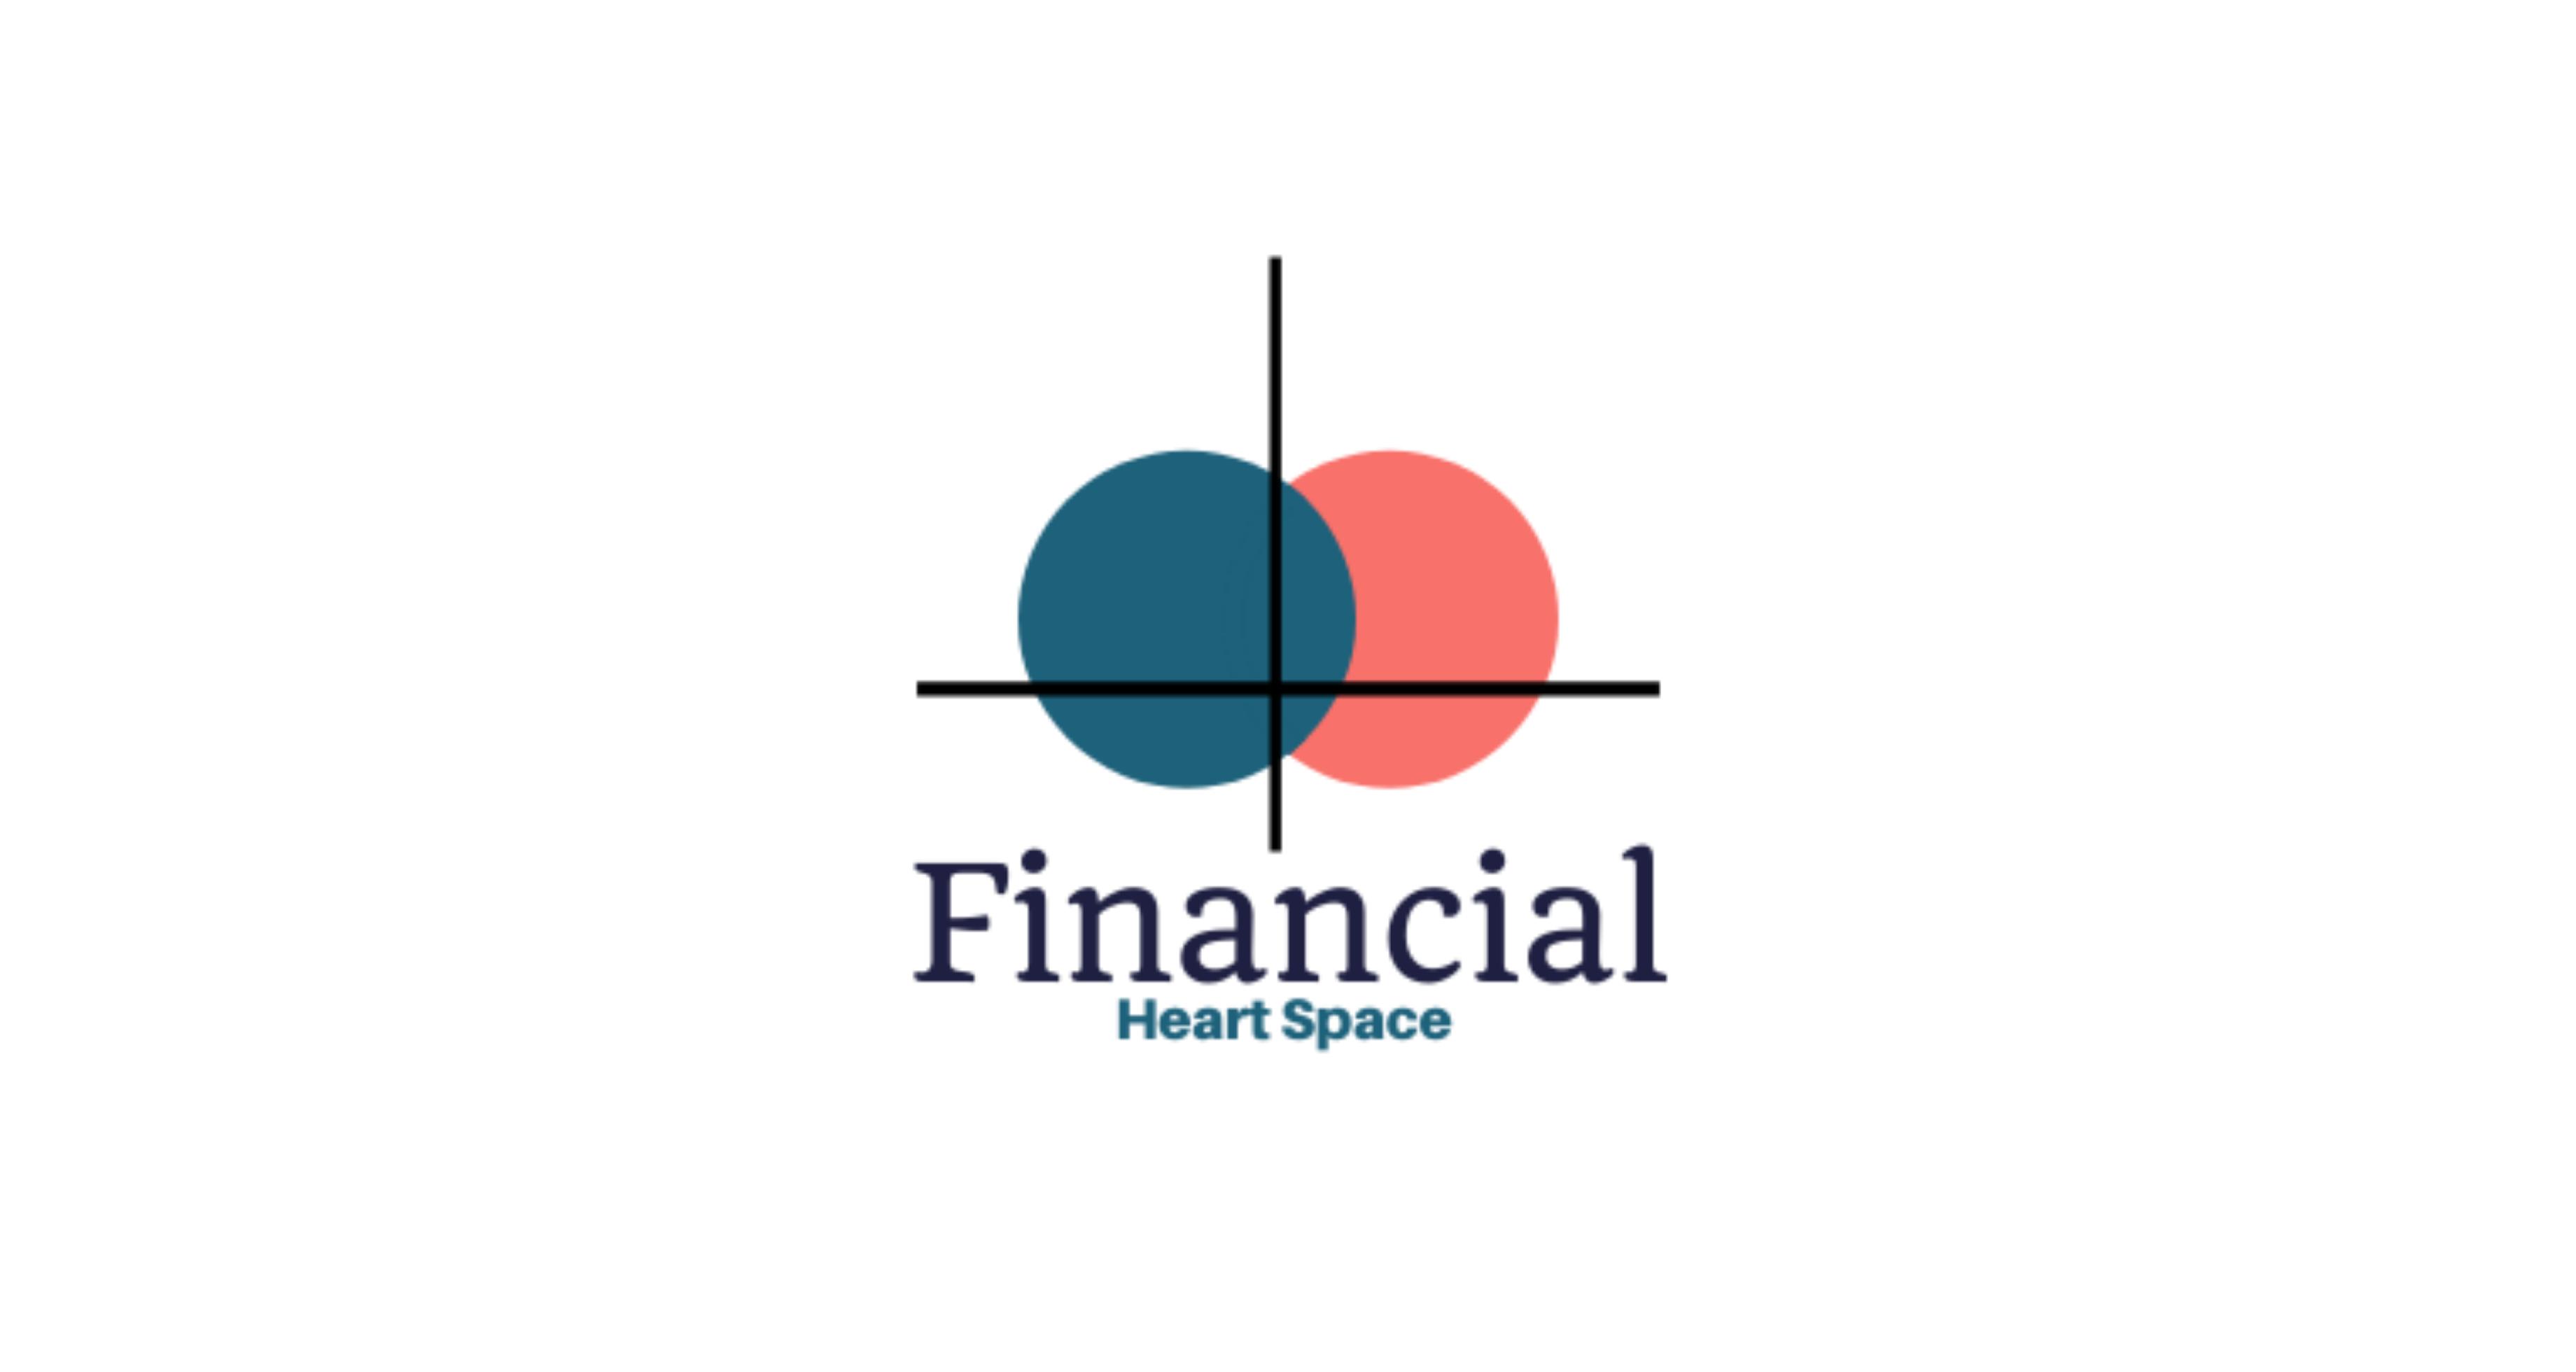 Financial Heart Space